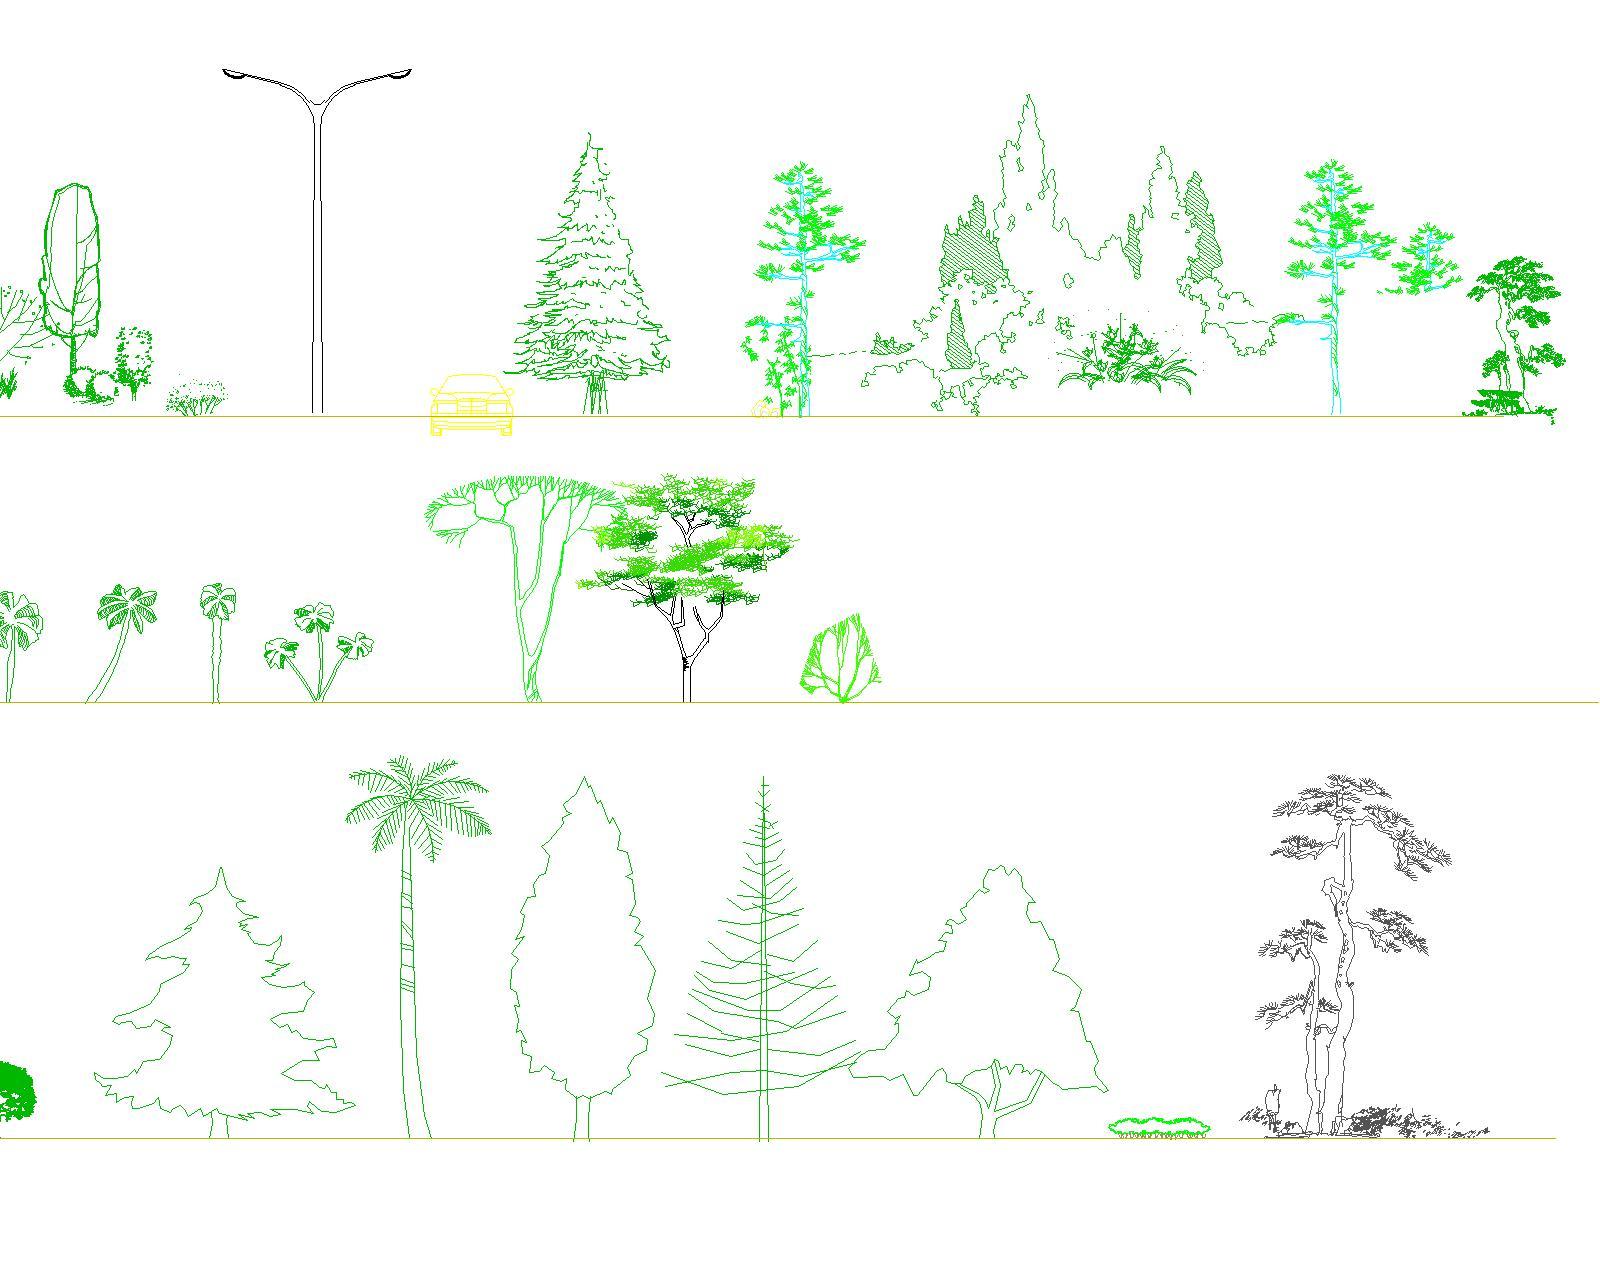 ps手绘立面树素材; 立面树 _co土木在线(原网易土木在线); 立面树图库